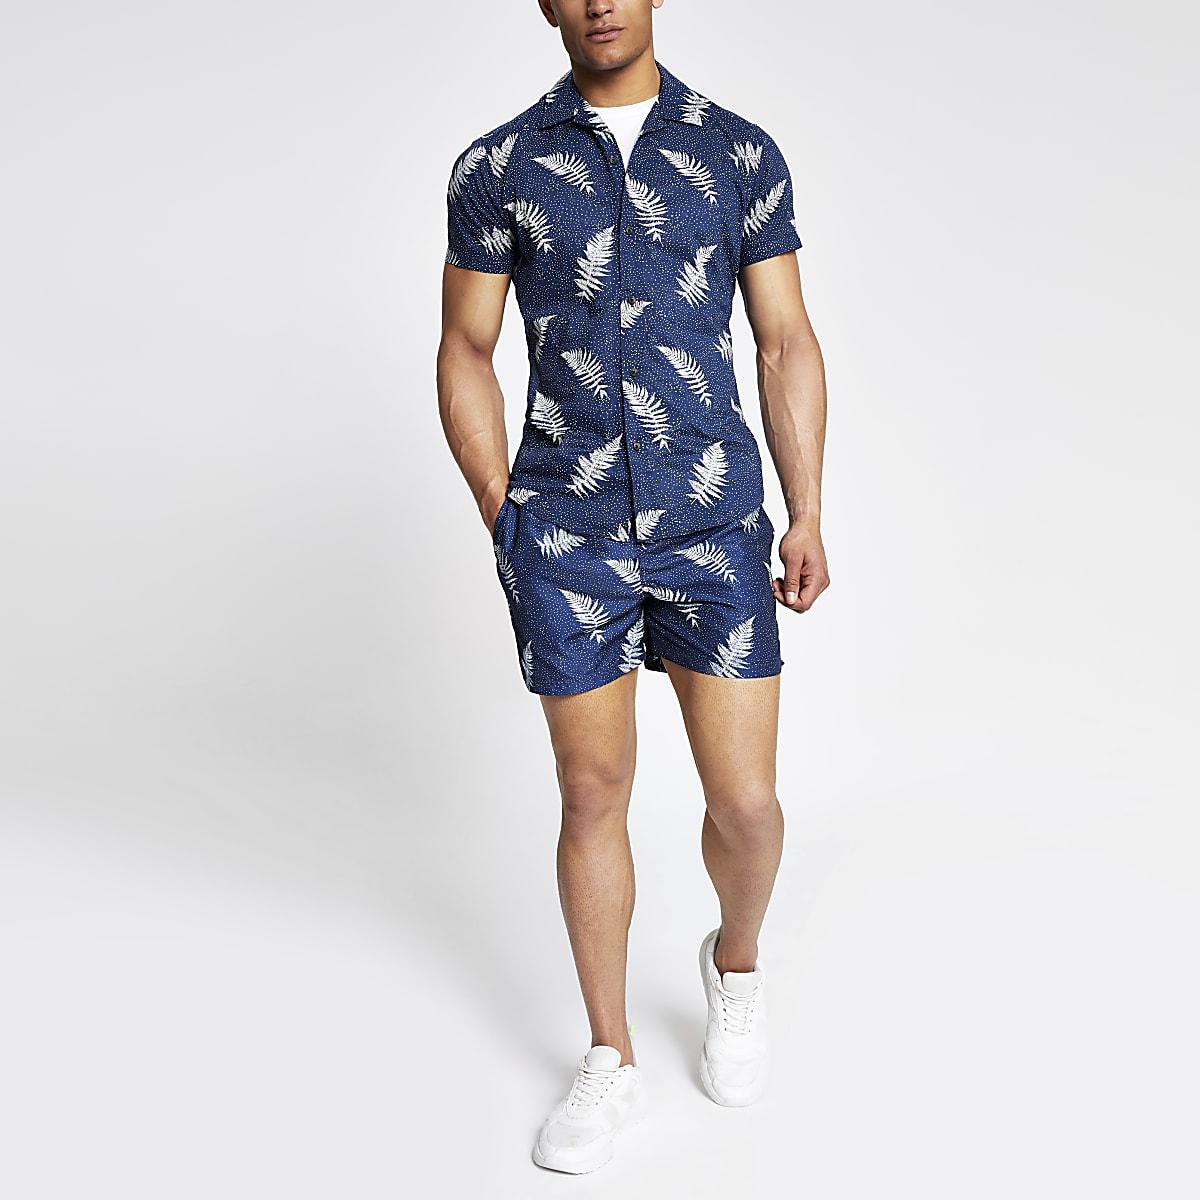 Selected Homme – Marinebalues Regular Fit Hemd mit Print